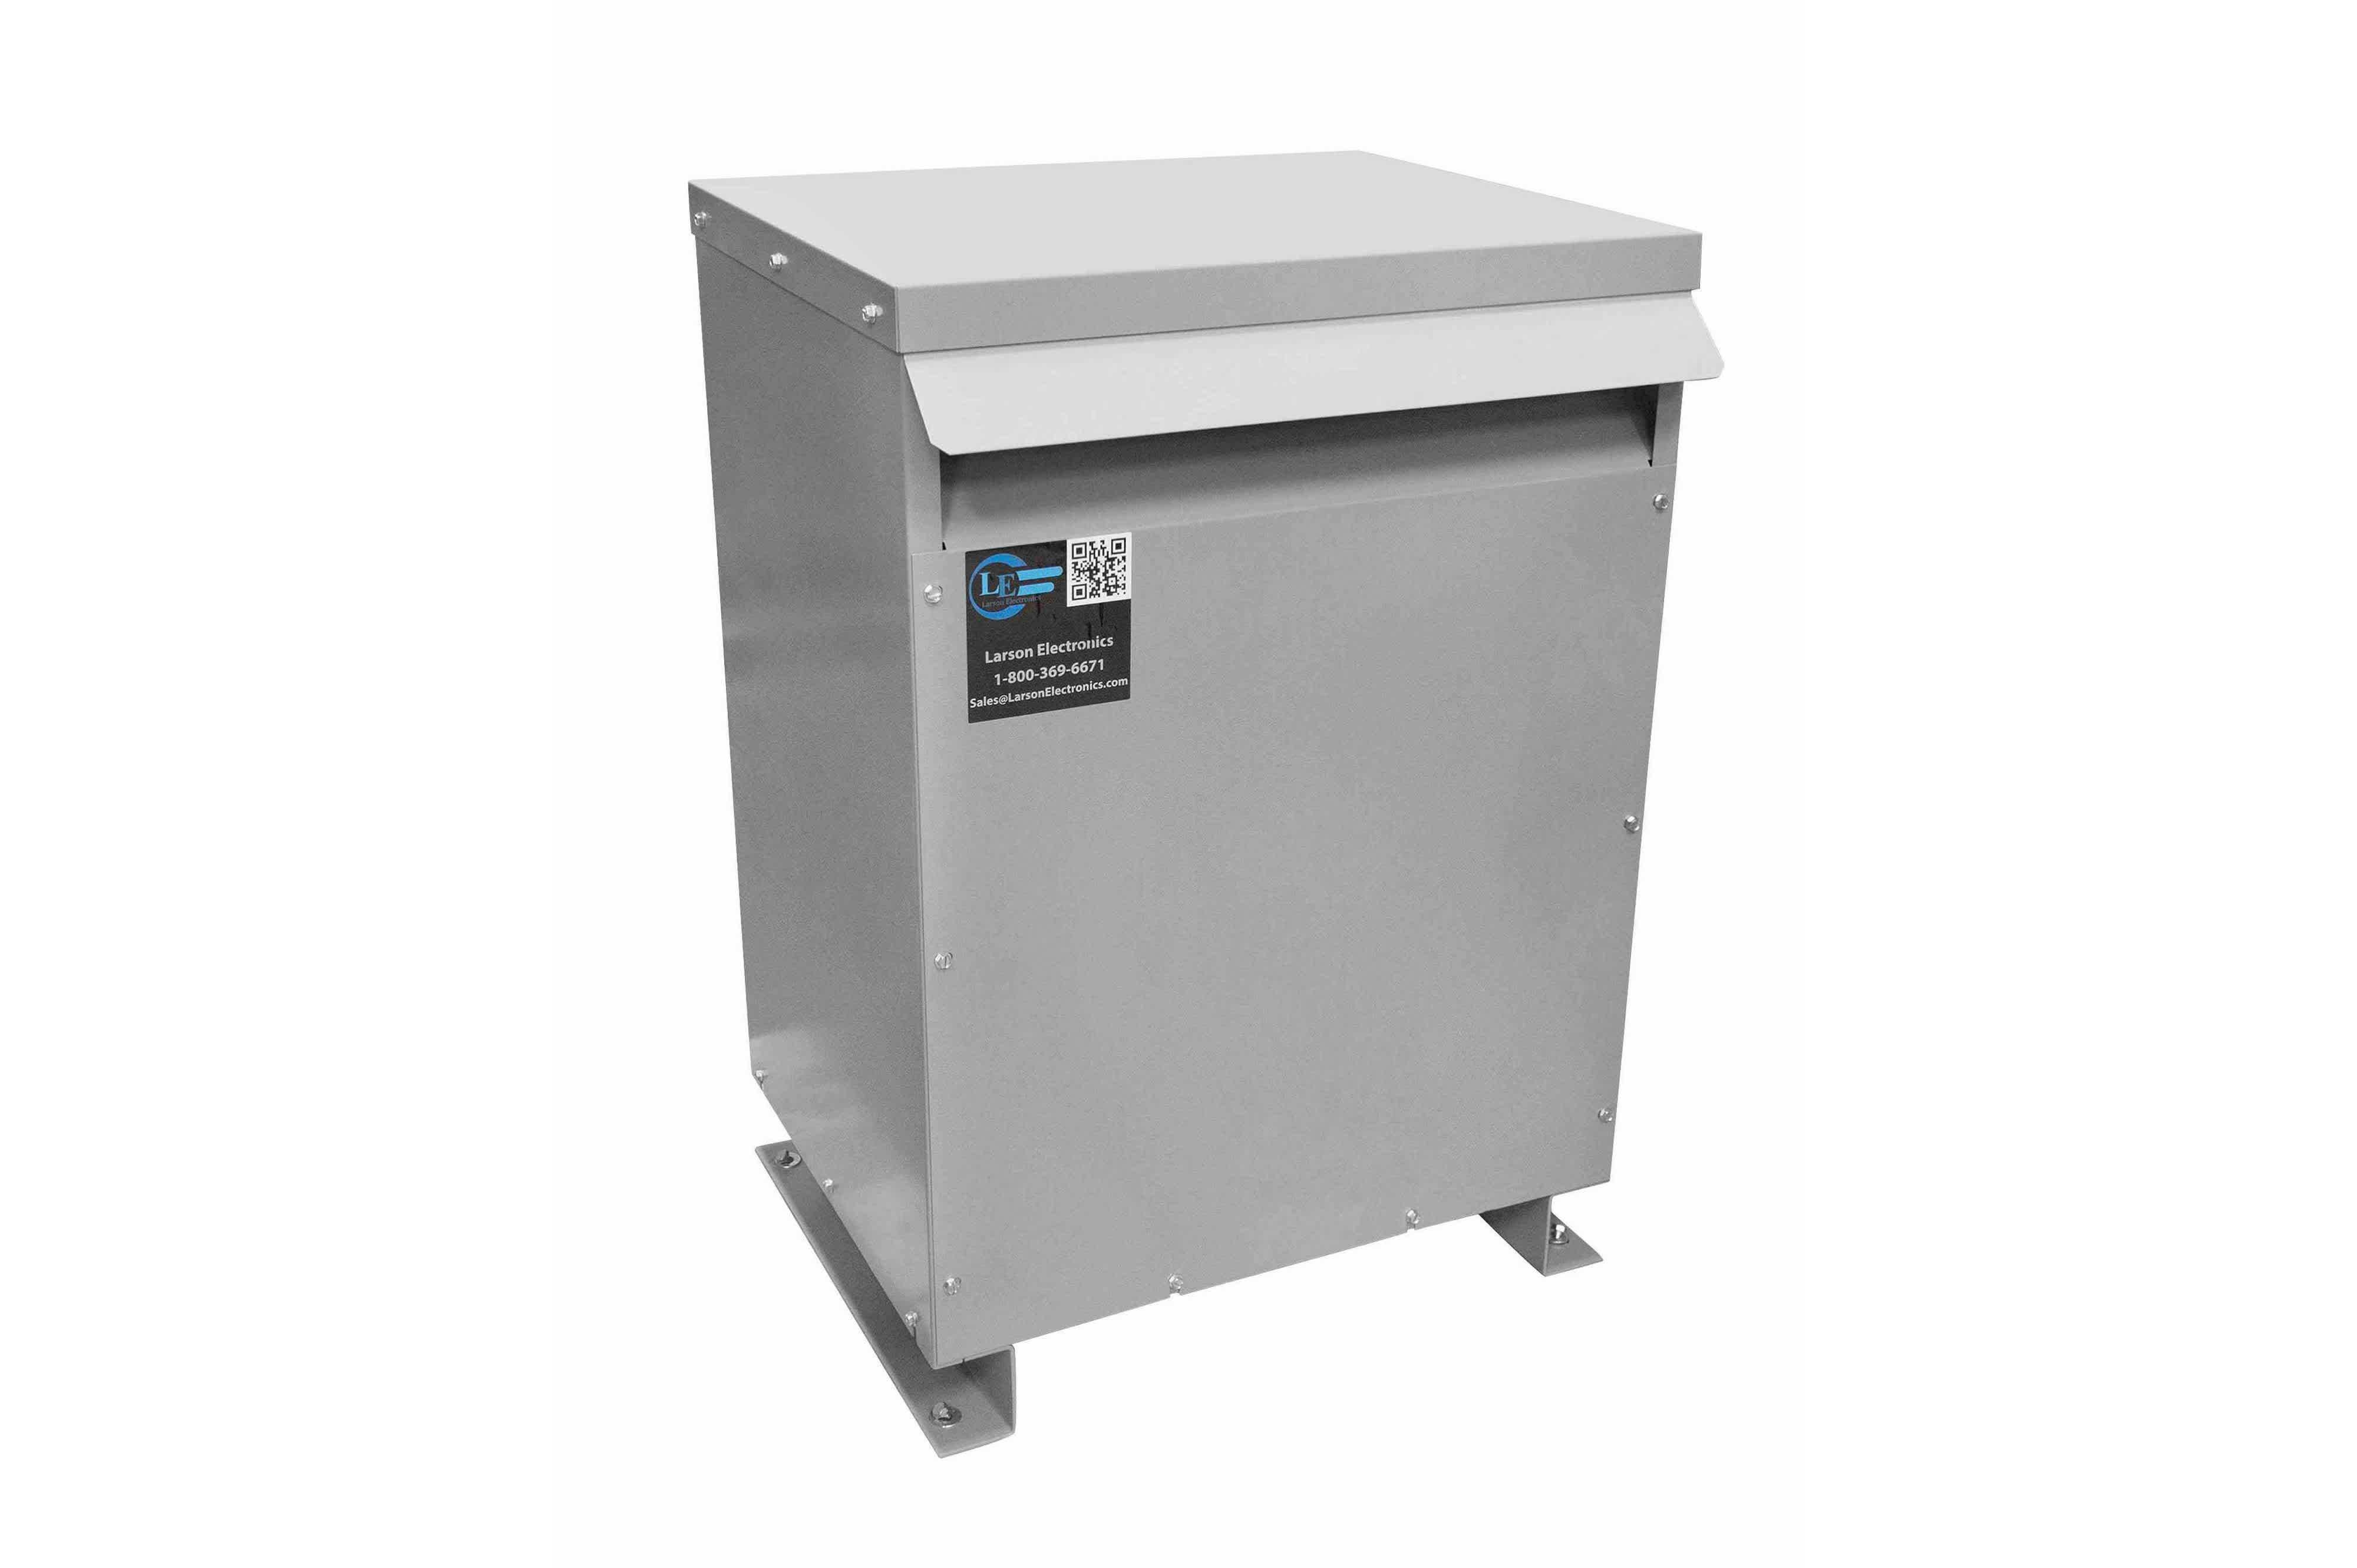 60 kVA 3PH Isolation Transformer, 460V Wye Primary, 575Y/332 Wye-N Secondary, N3R, Ventilated, 60 Hz